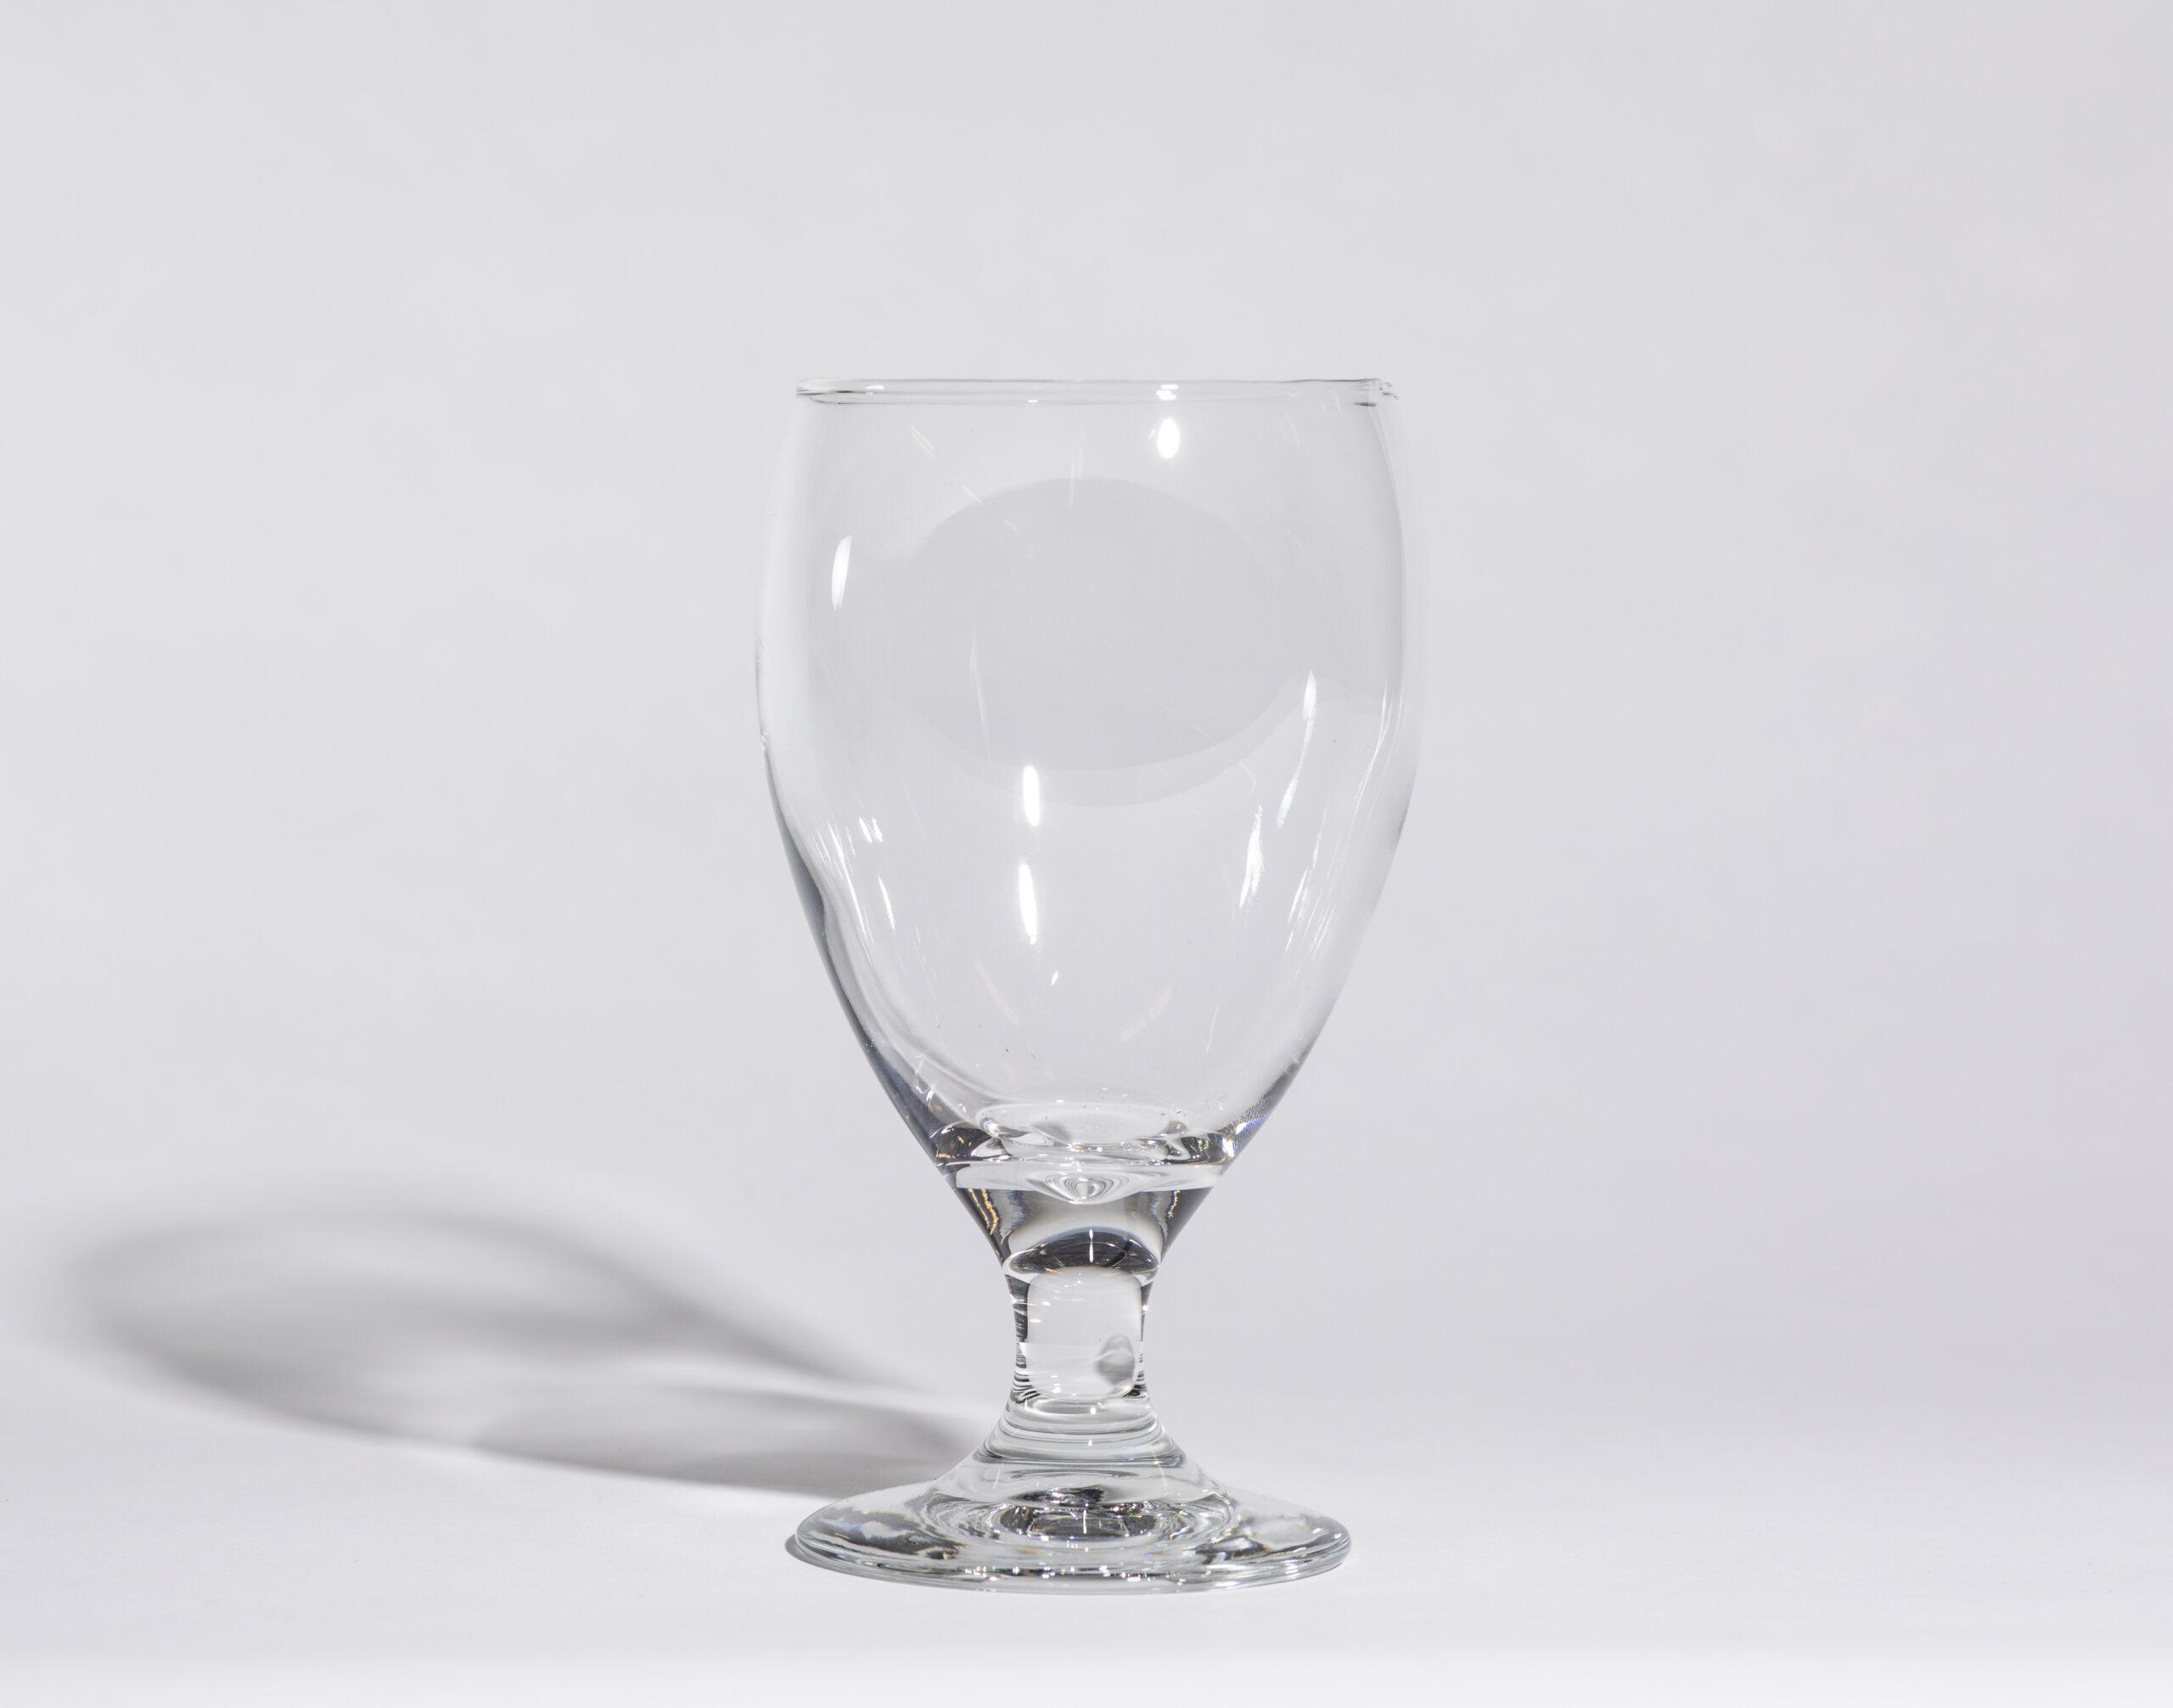 Water glasses (10oz, stemmed)